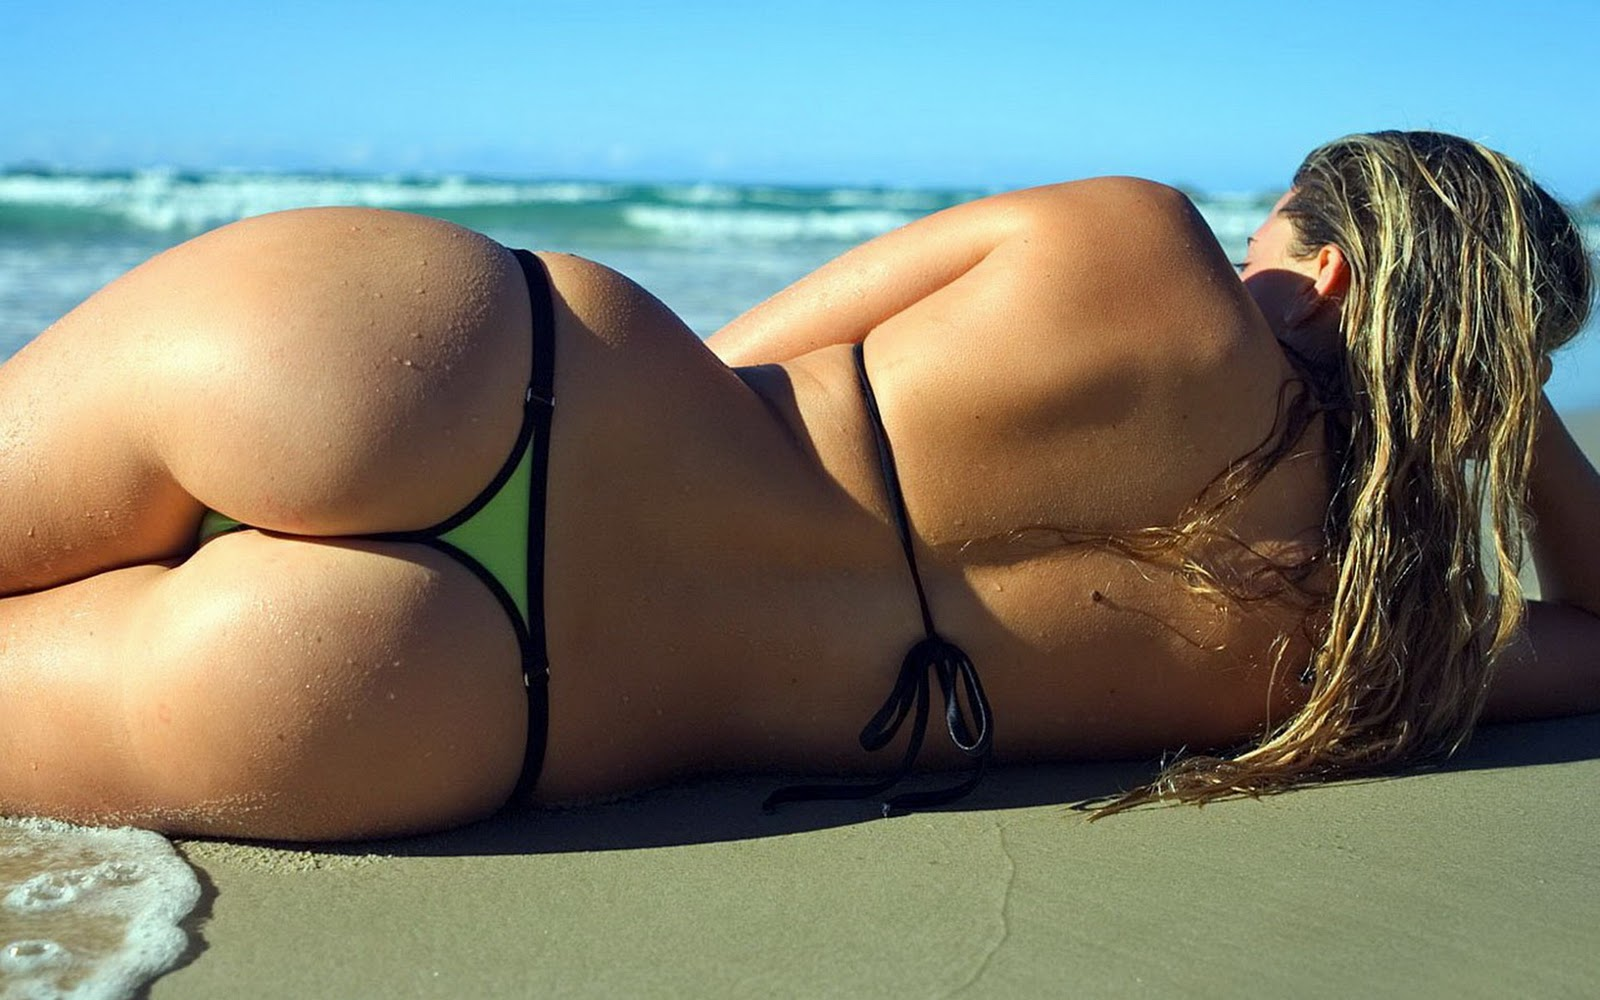 Bar Refaeli Poster Bikini Sexy Hot Model Actress New, Free Pp, Choose Your Size